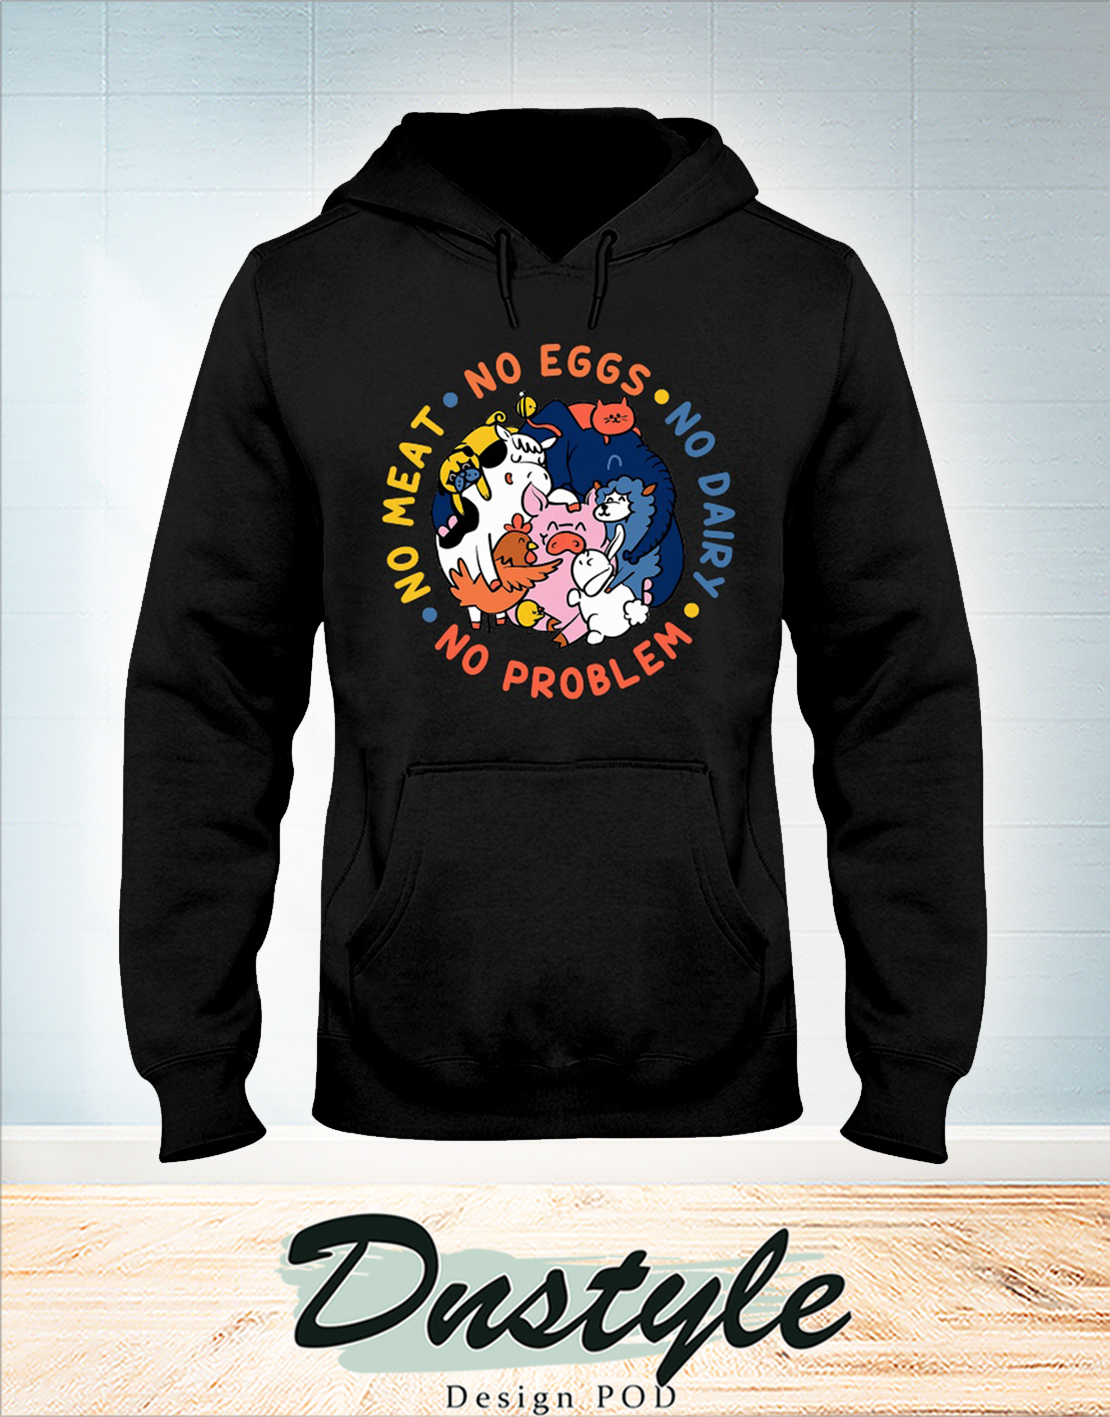 No meat no eggs no dairy no problem hoodie